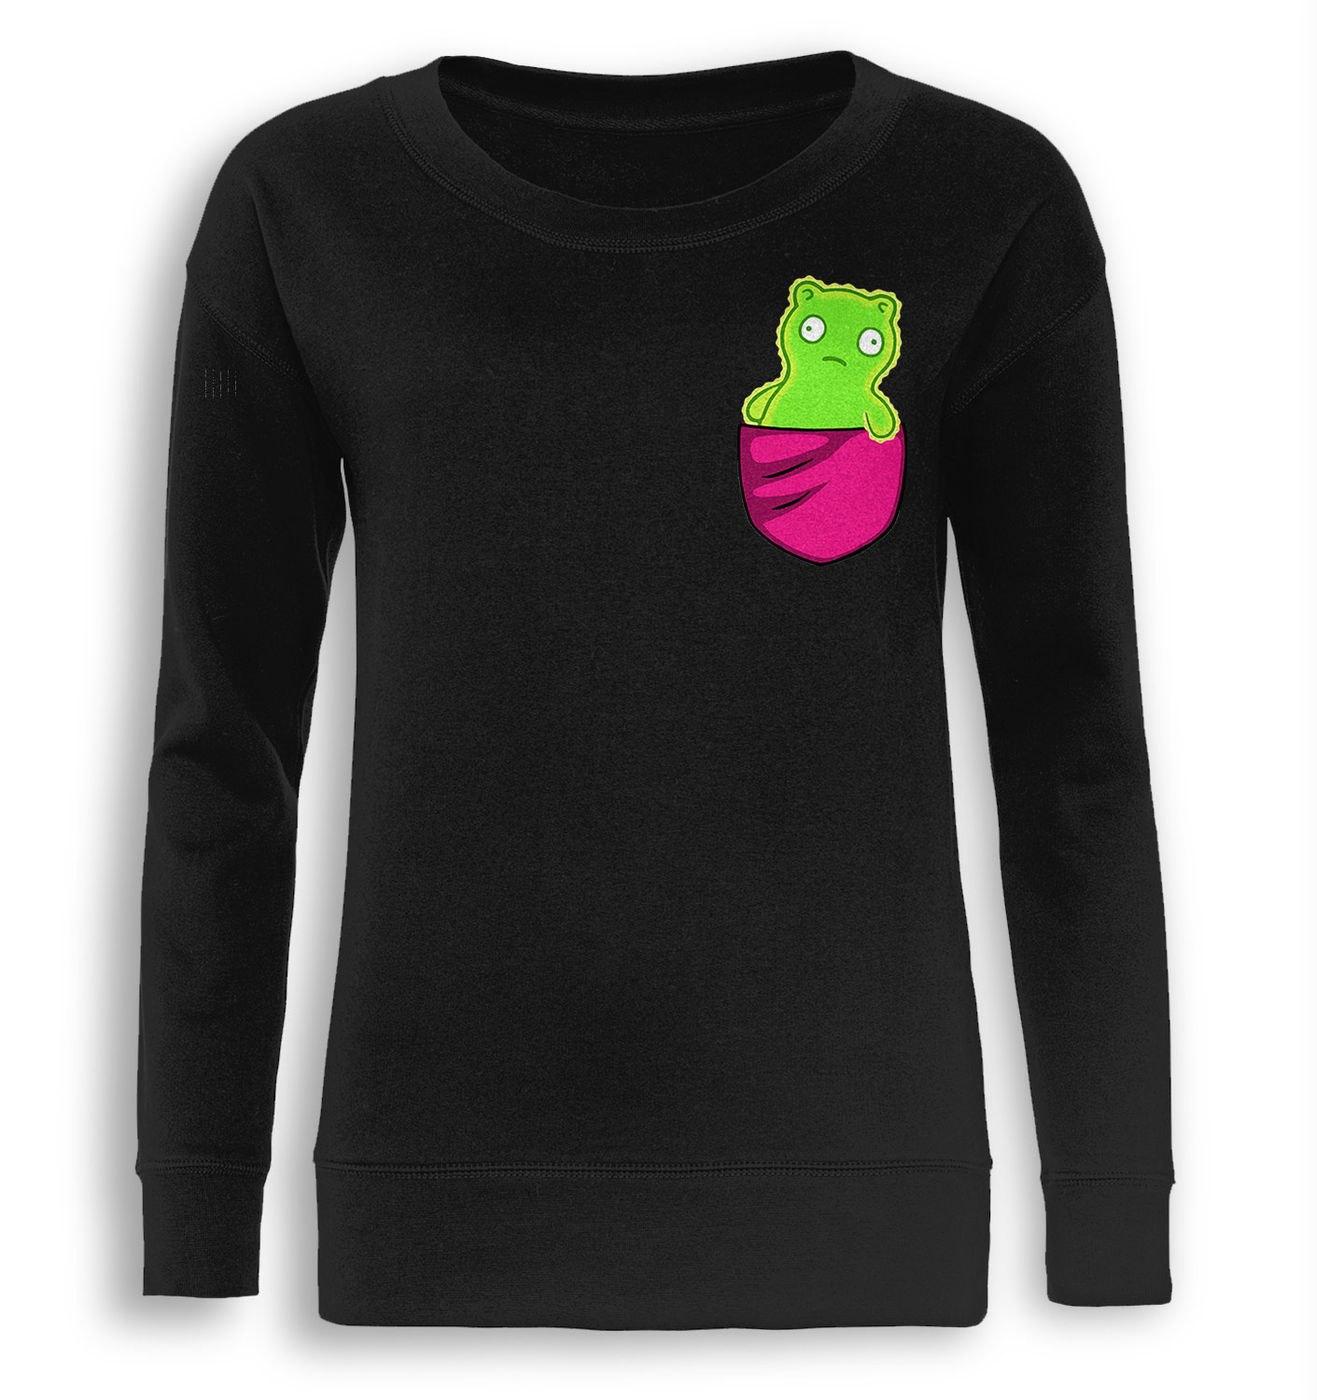 Kuchi Kopi Pocket fitted women's sweatshirt by Something Geeky